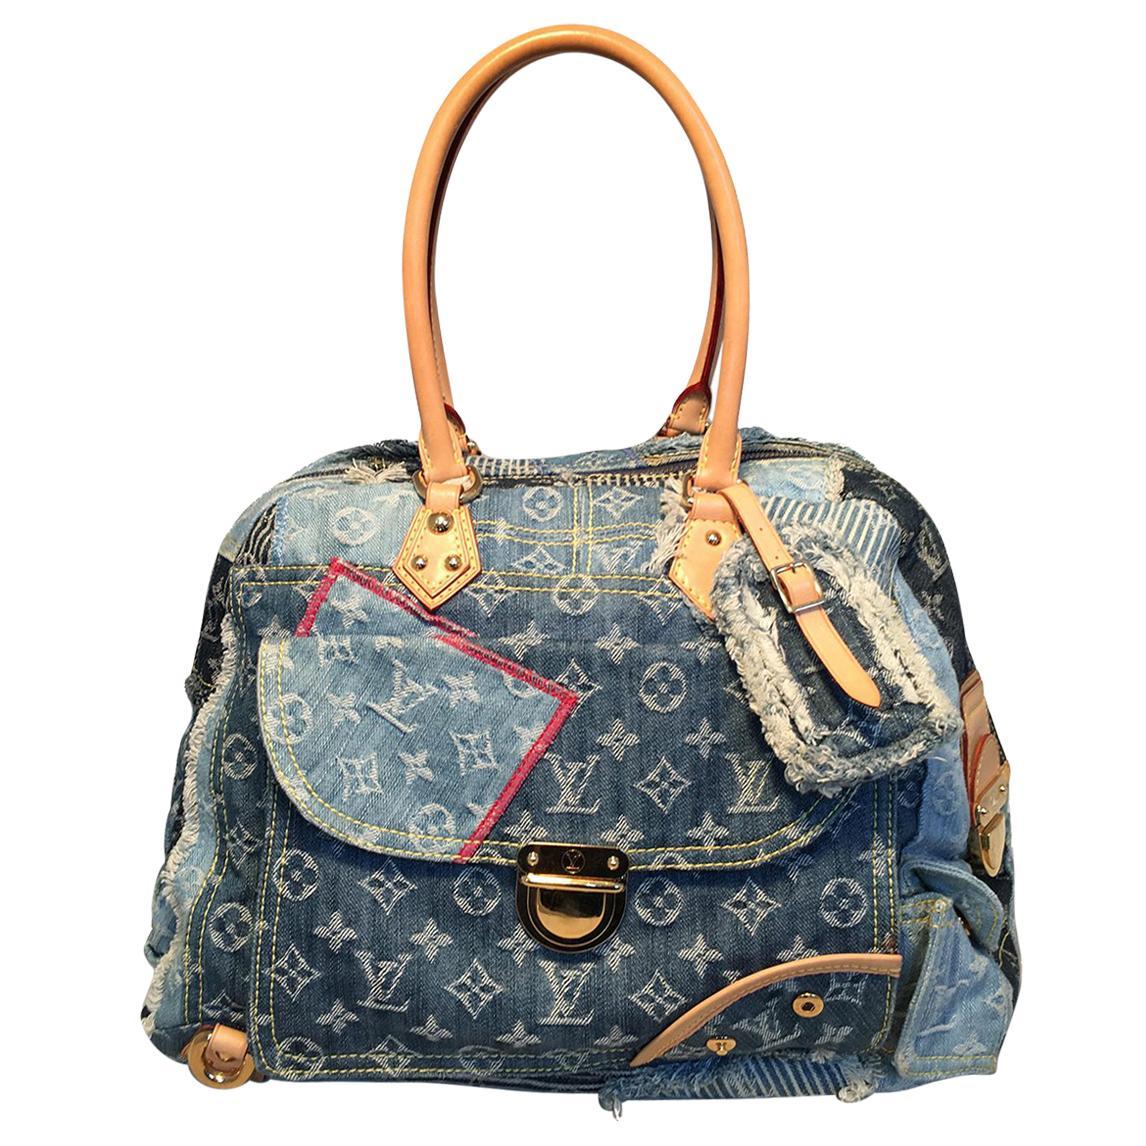 b9567aac01a4 Vintage Louis Vuitton  Bags